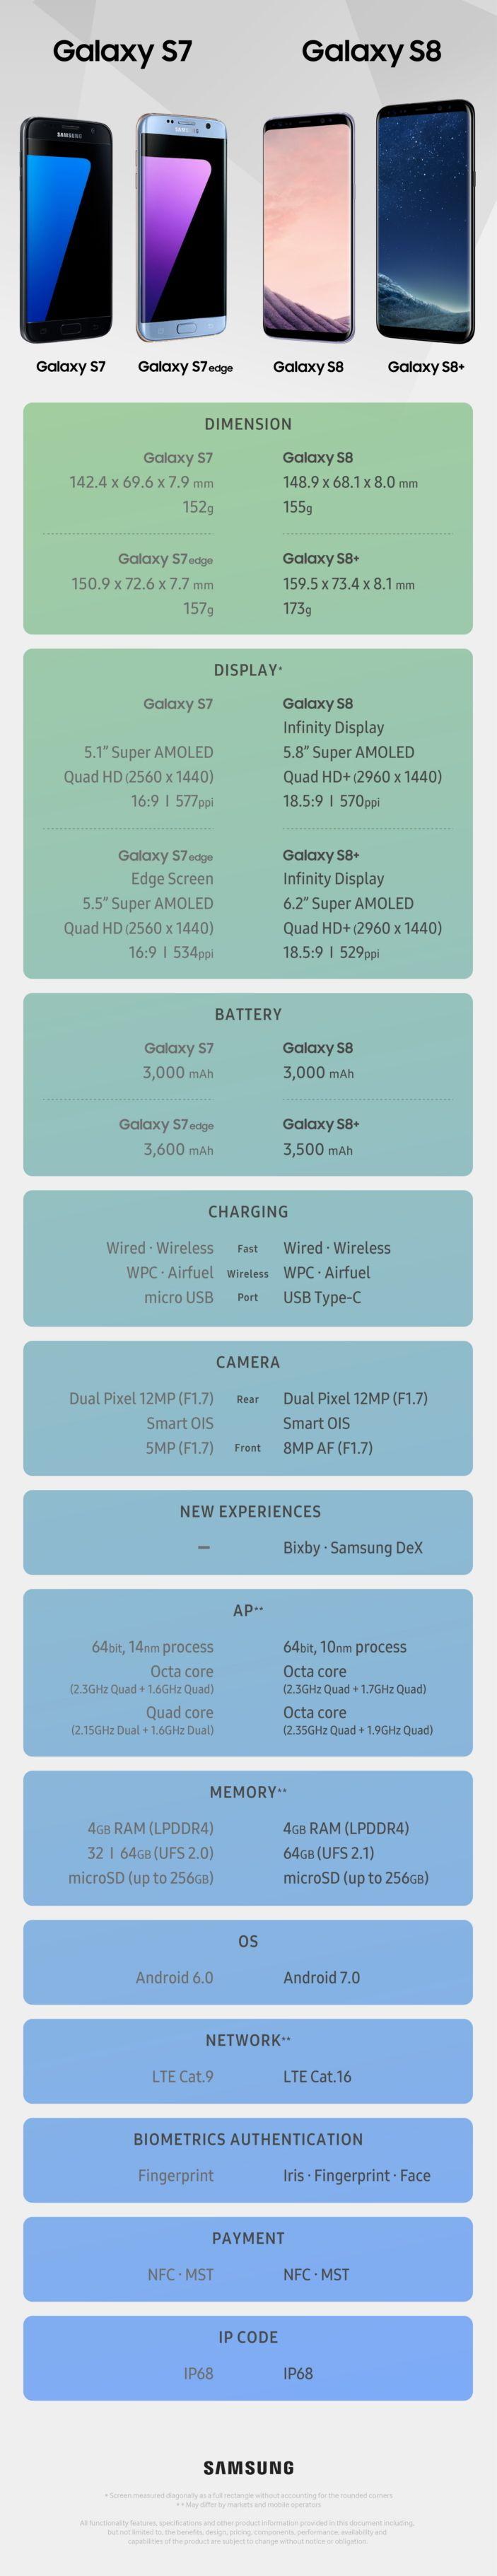 Compare Galaxy S7 vs Galaxy S8 vs Galaxy S7 edge vs Galaxy S8 Plus Specs